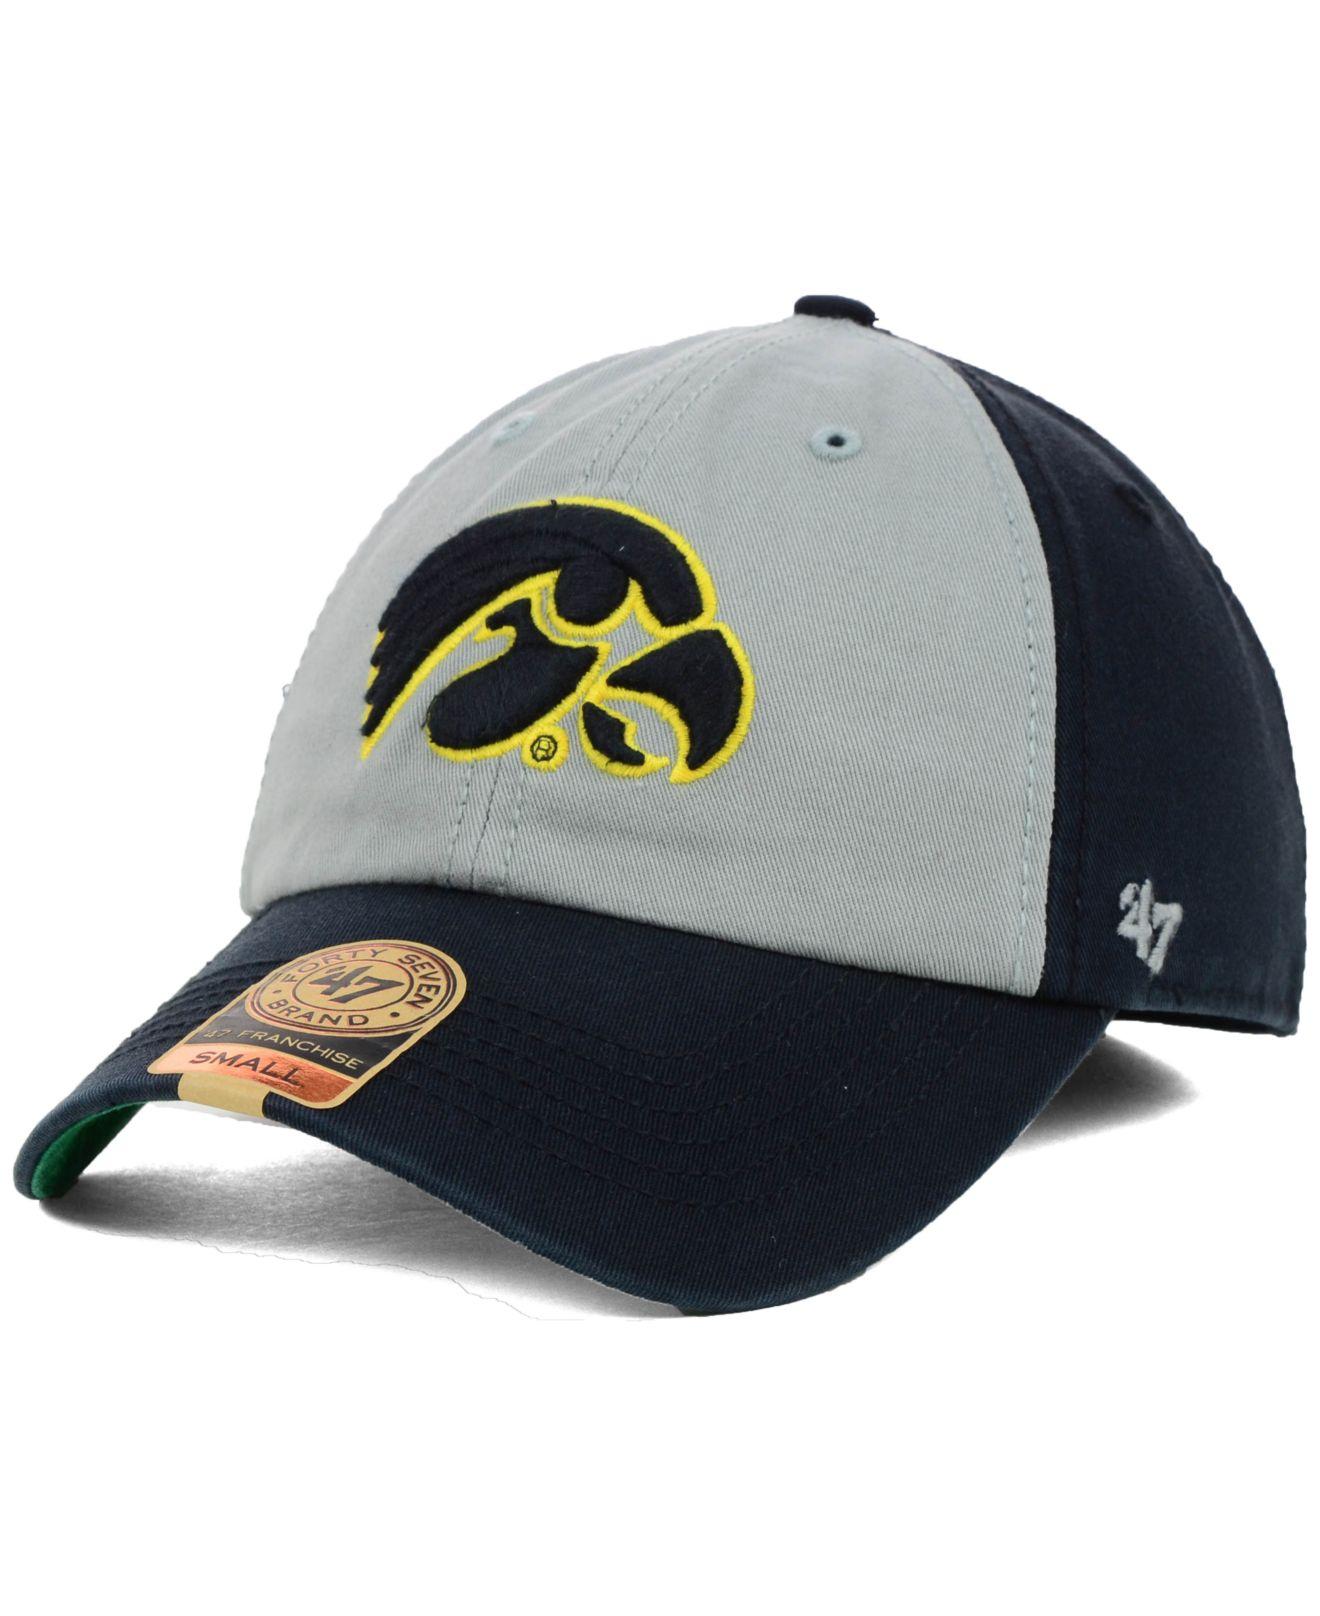 60045933658f5 47 Brand Iowa Hawkeyes Vip Franchise Cap in Metallic for Men - Lyst